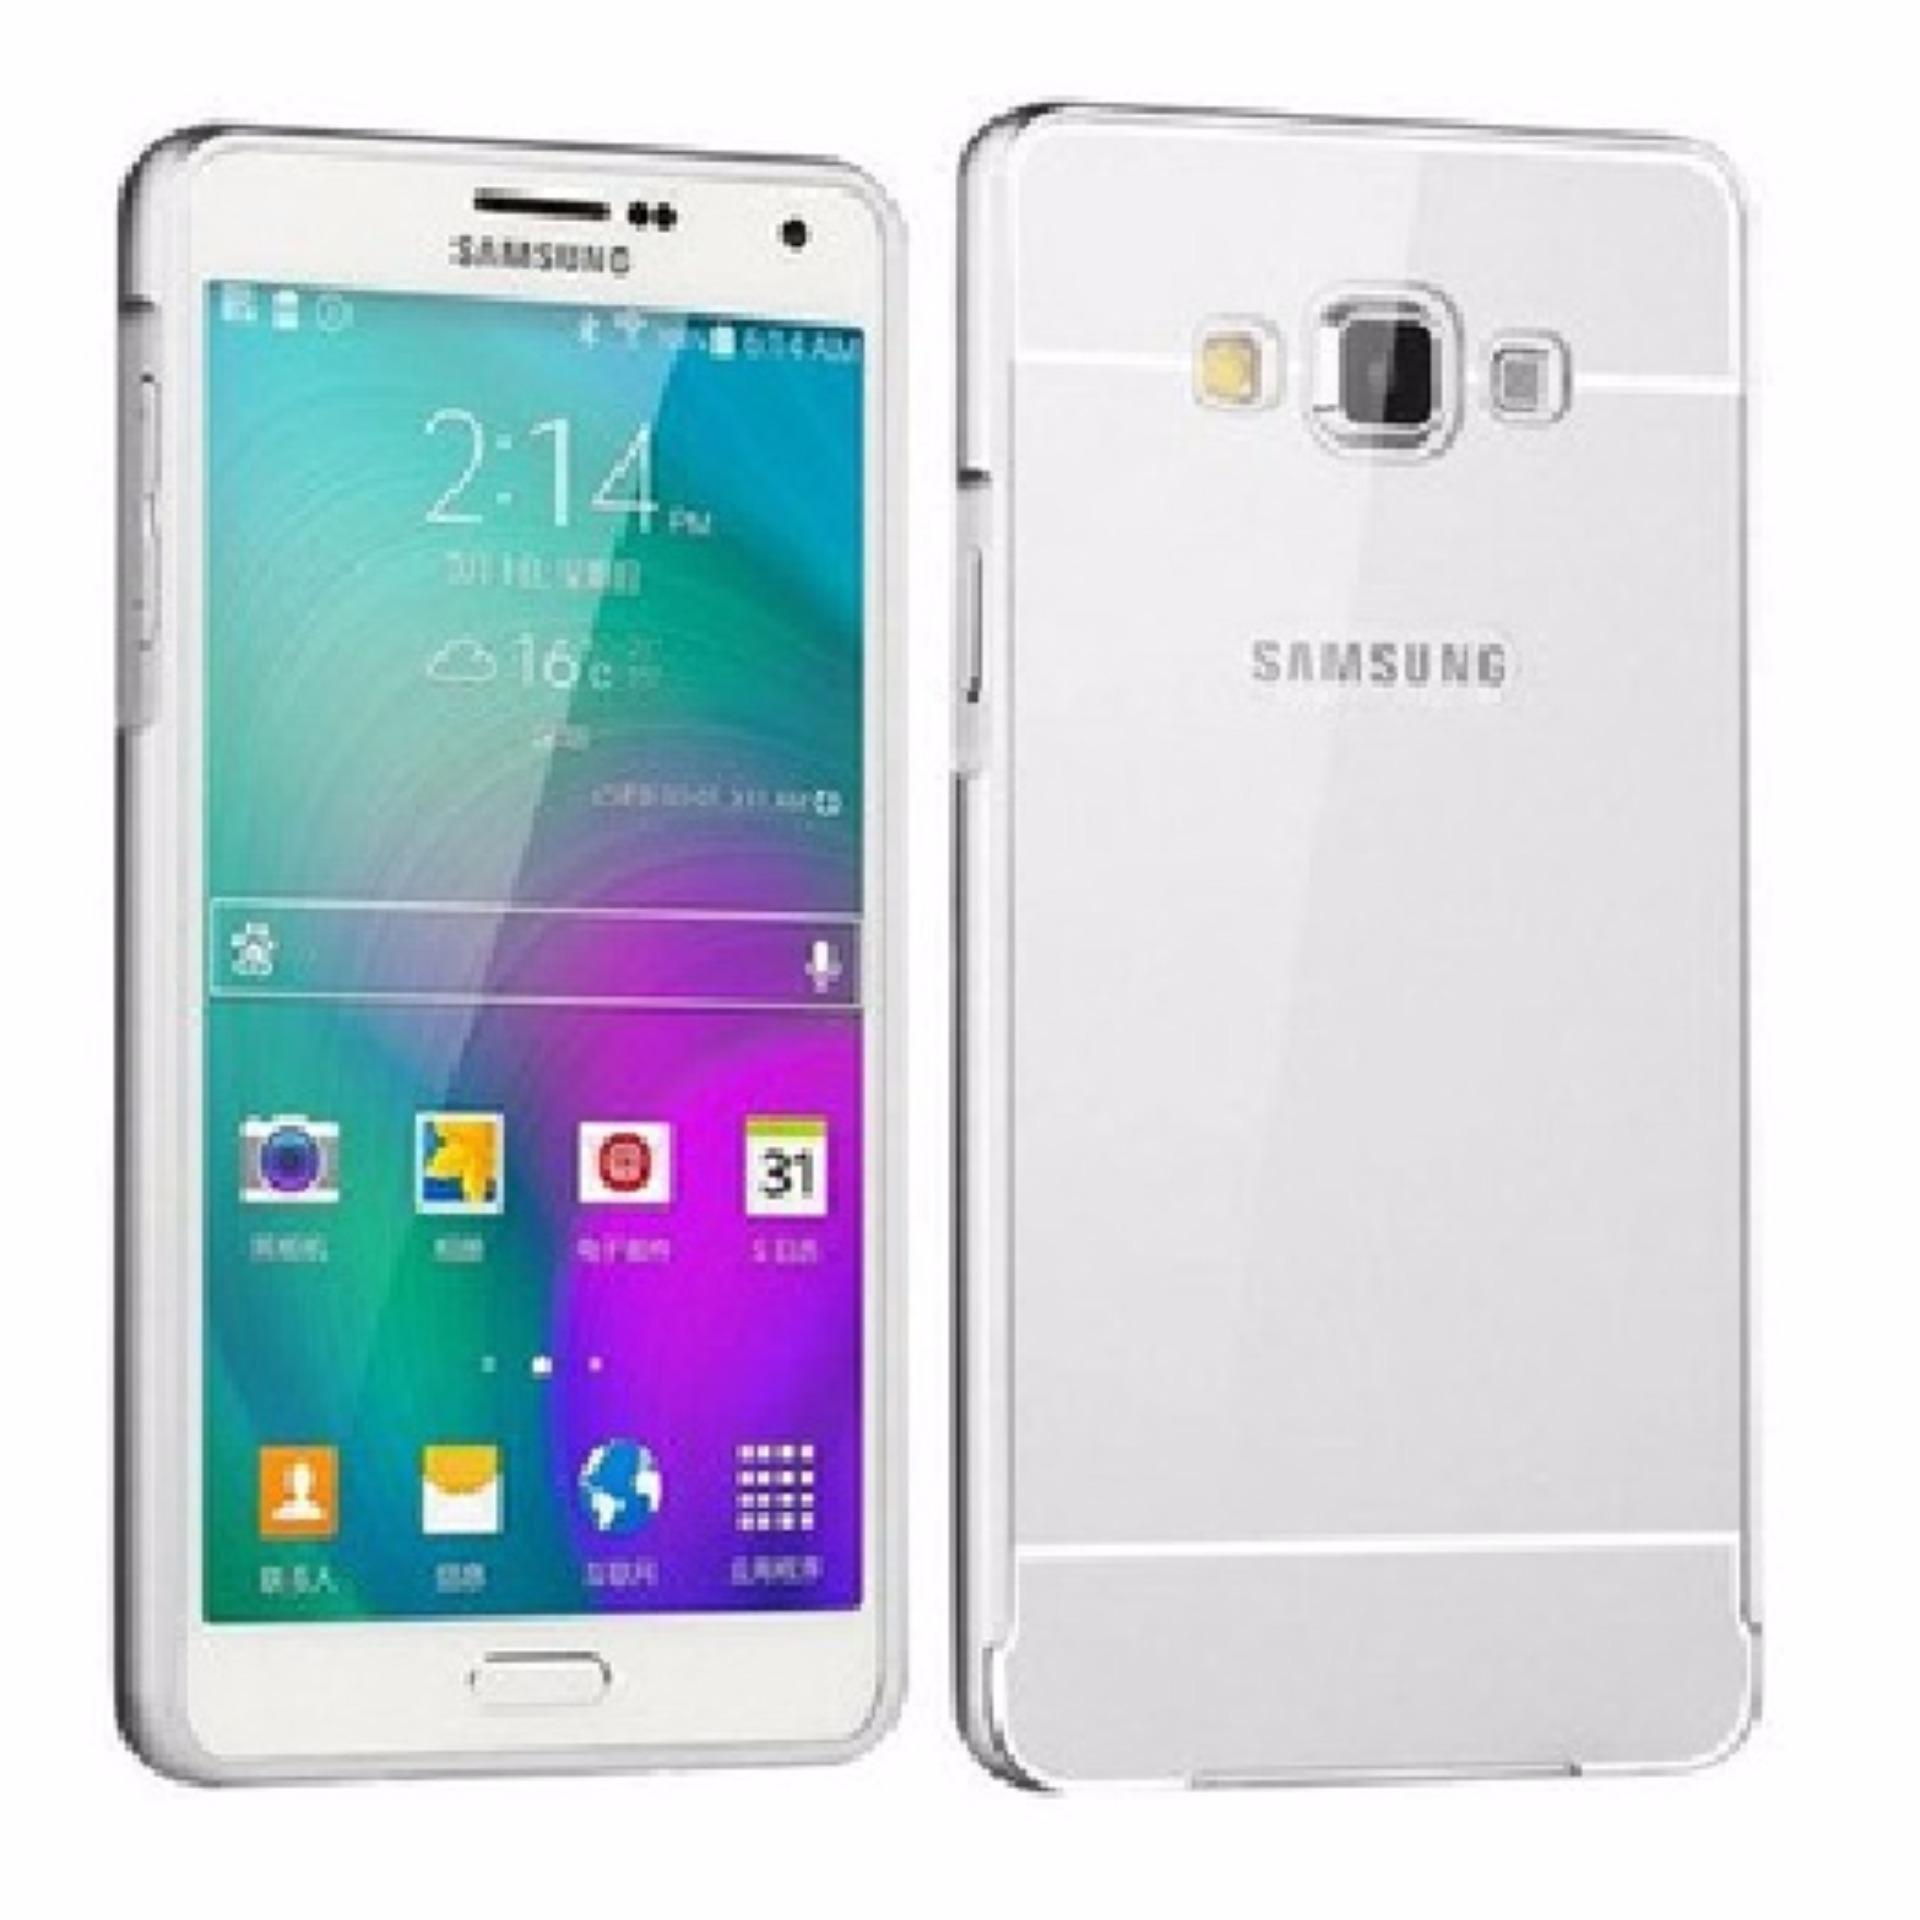 Samsung SM-G532G/DS J2 Prime (Silver)